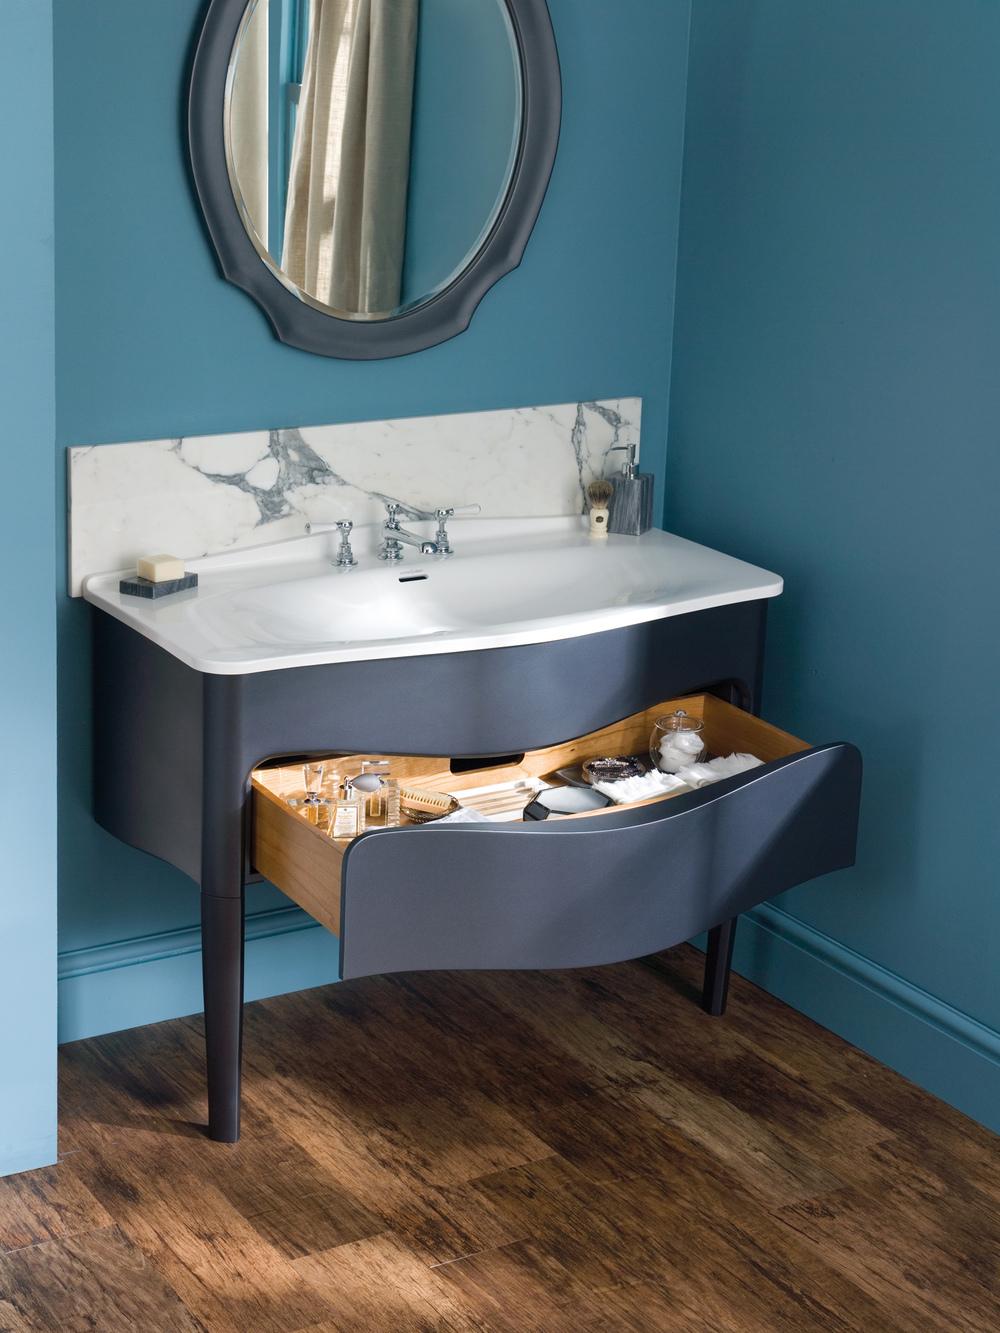 Mandello Vanity, designed by Meneghello Paolelli Associati for V+A Baths | Photo courtesy V+A Baths